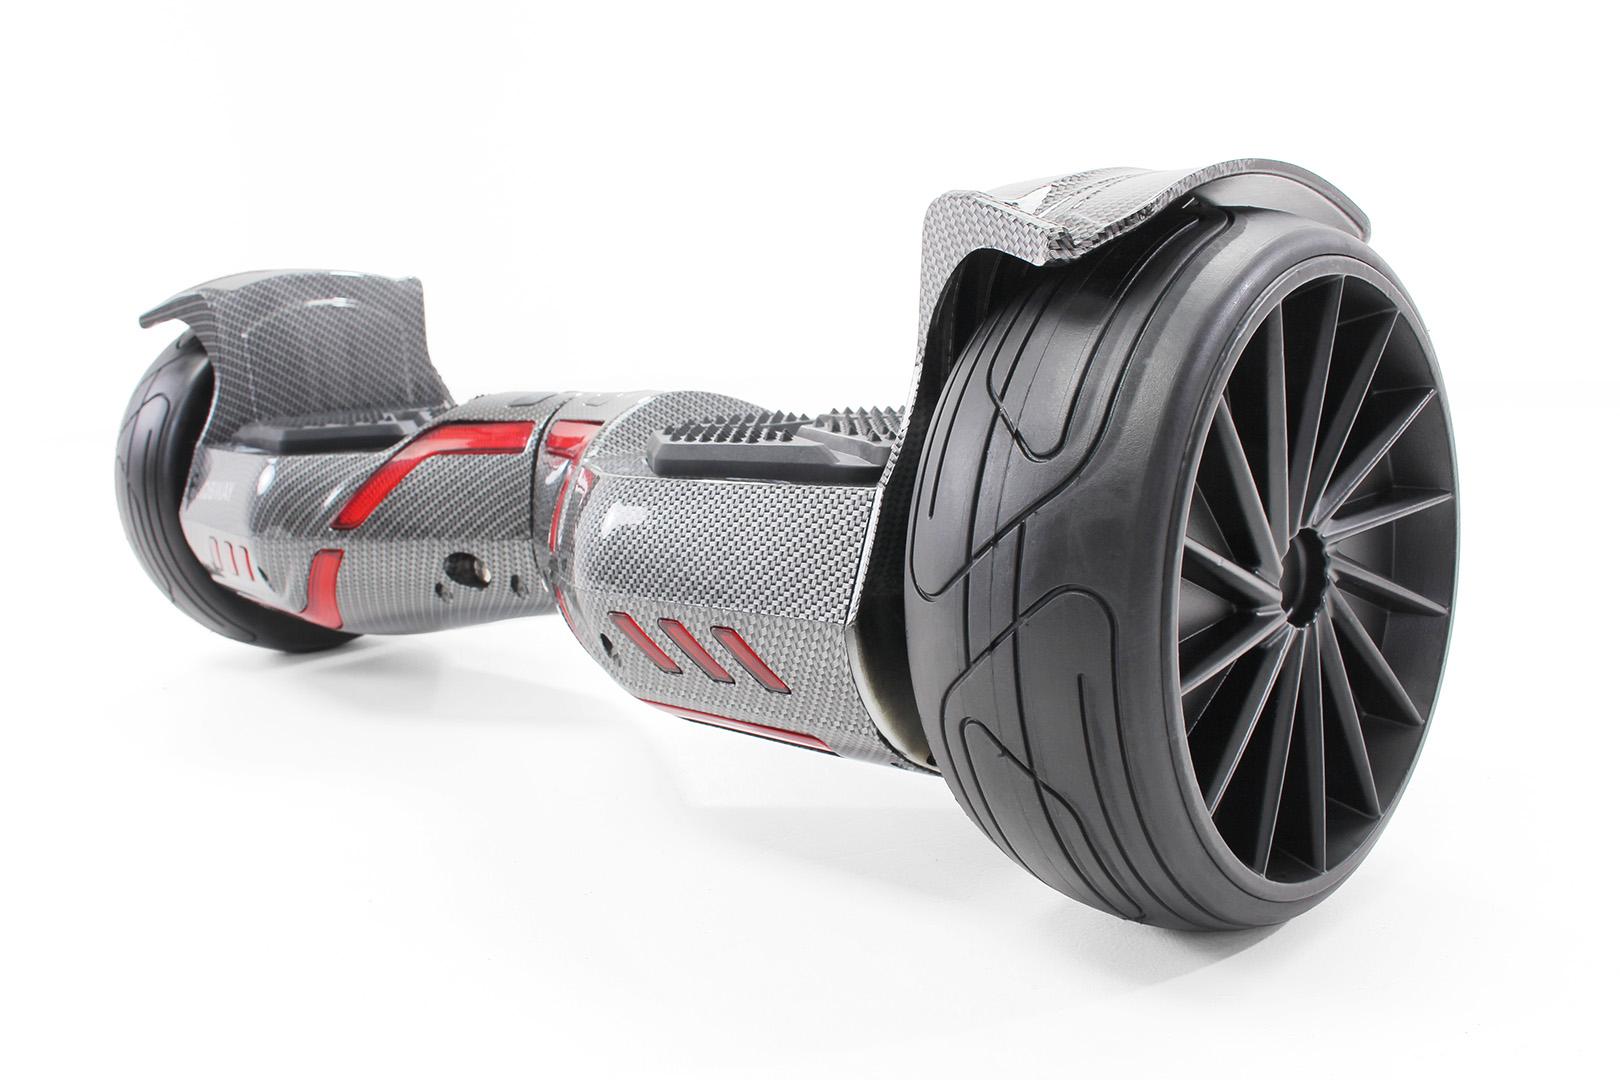 robway x2 balance scooter jetzt nur 279. Black Bedroom Furniture Sets. Home Design Ideas